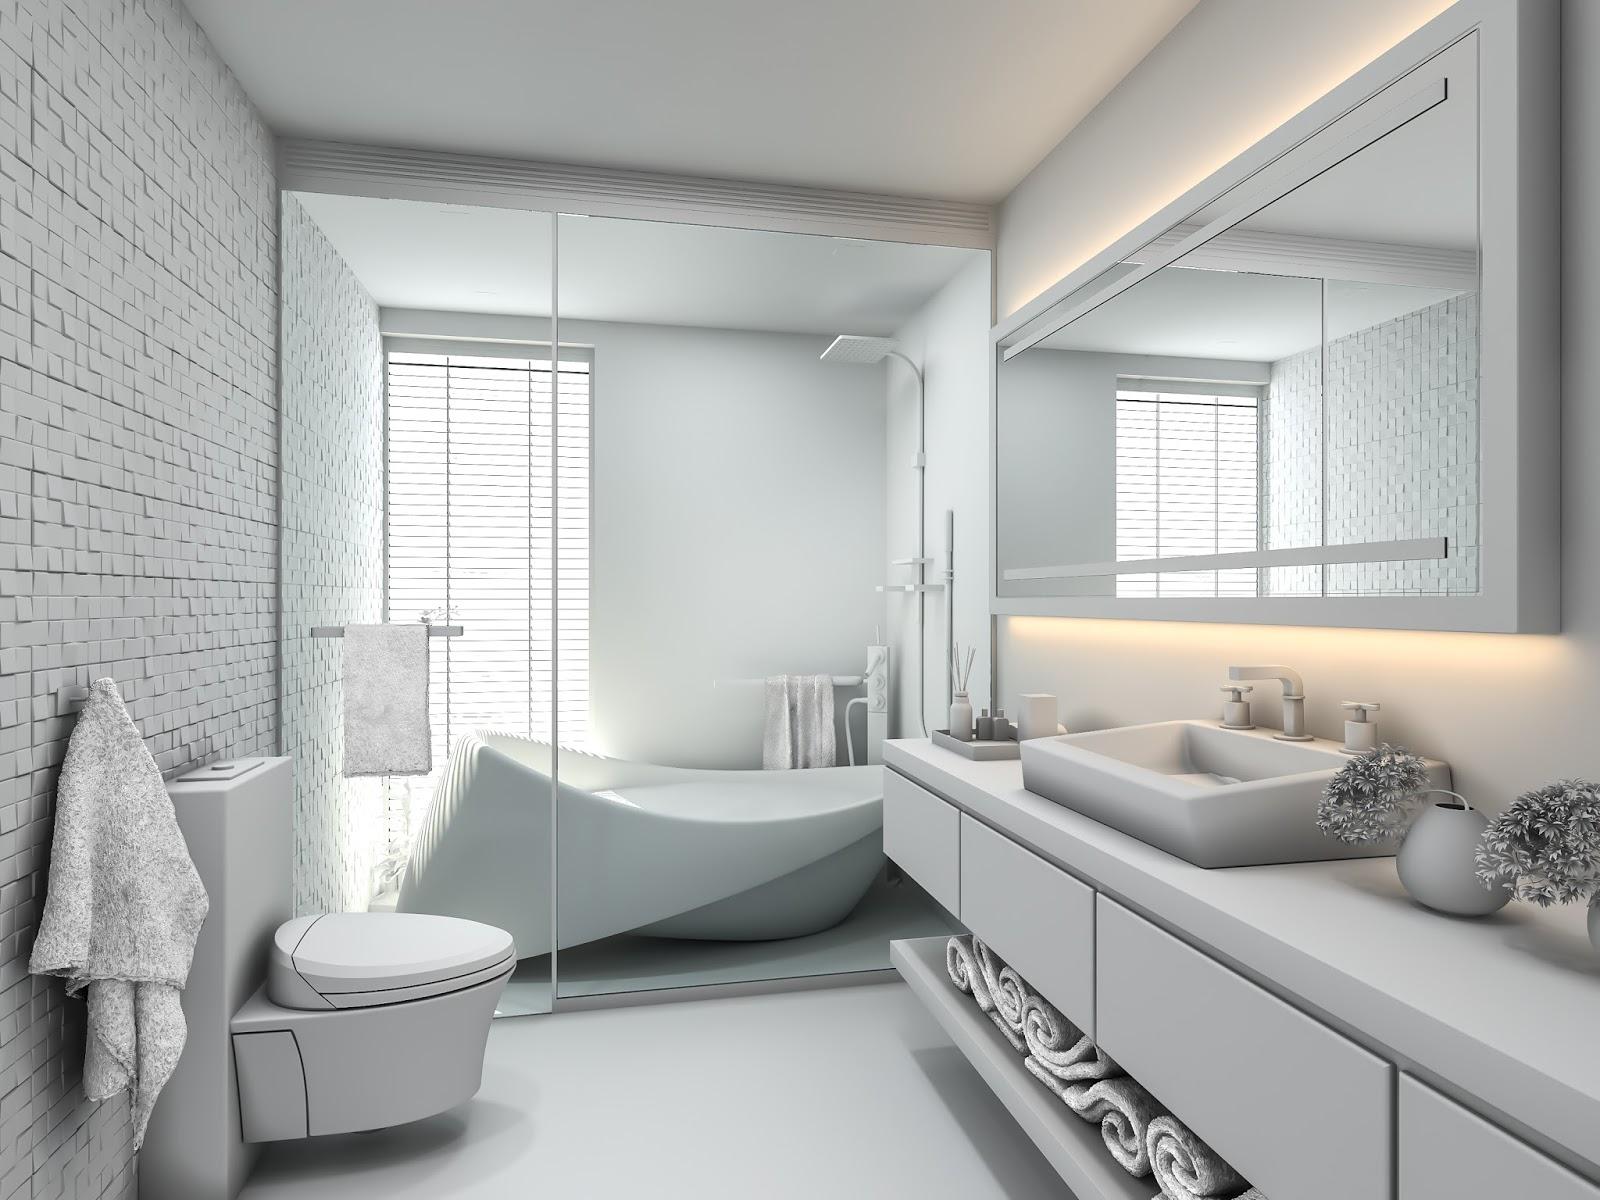 How To Create A Greyscale Bathroom: Ravi Koli 3d Artist